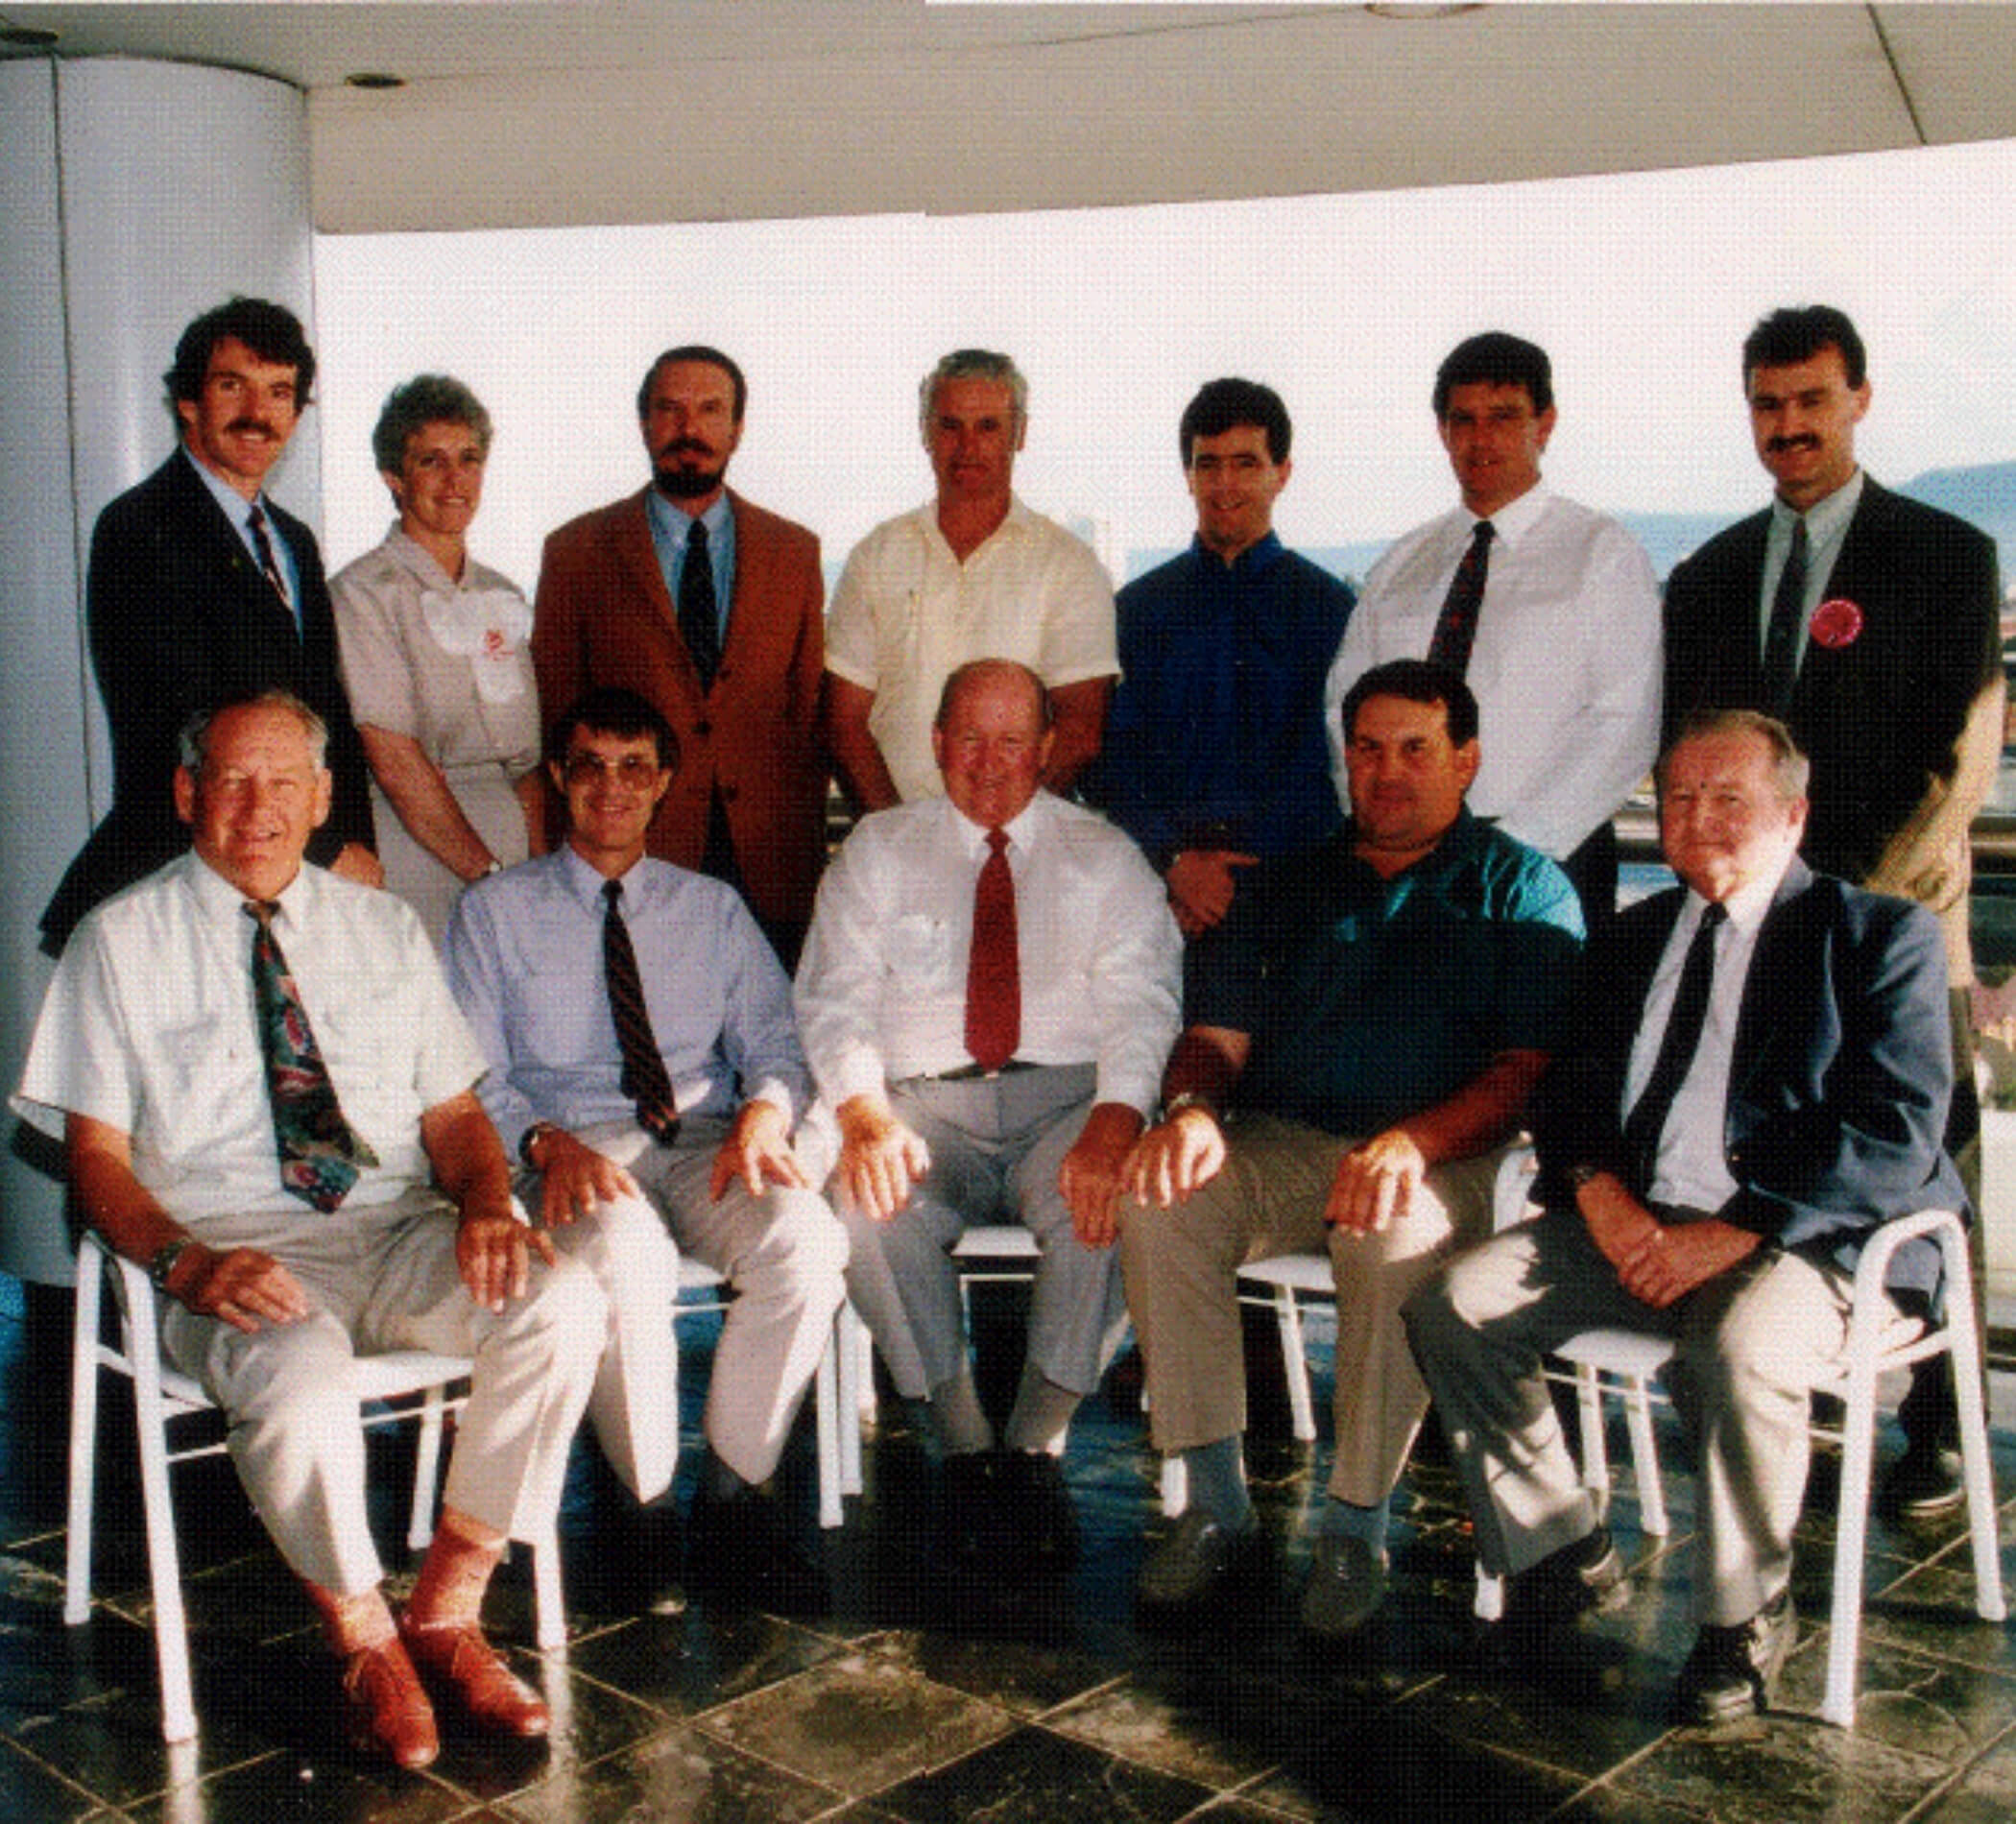 1980s Board